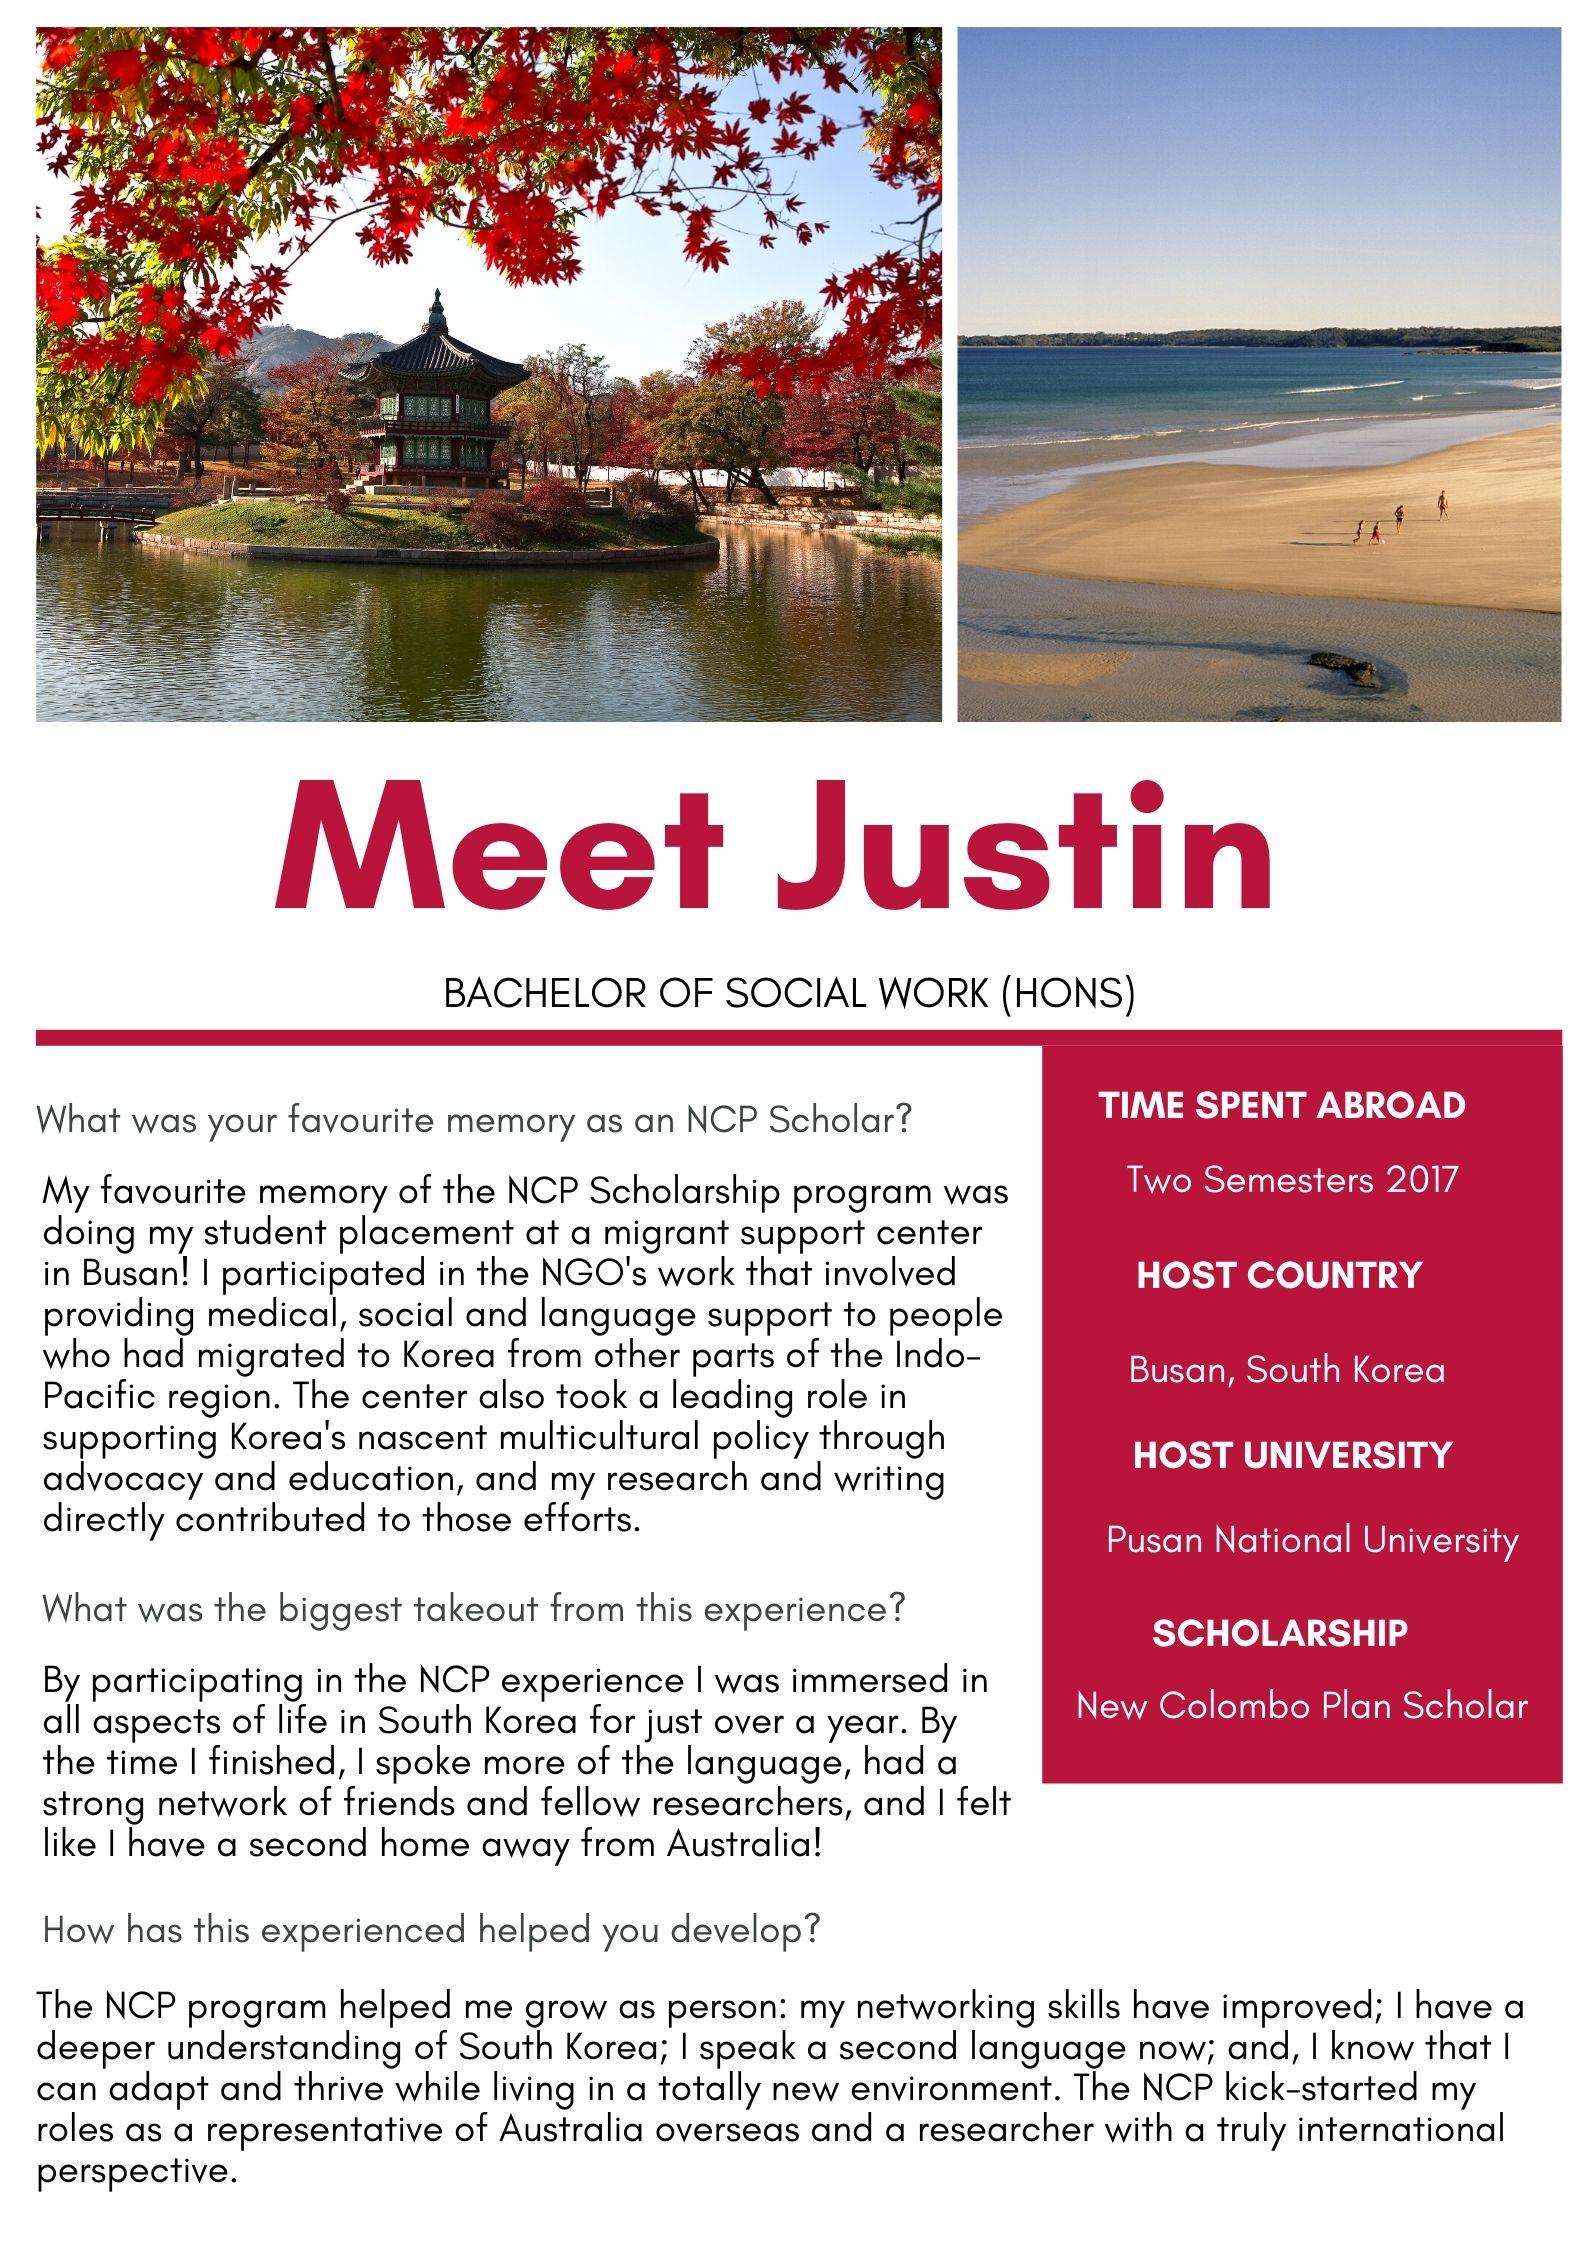 Meet Justin